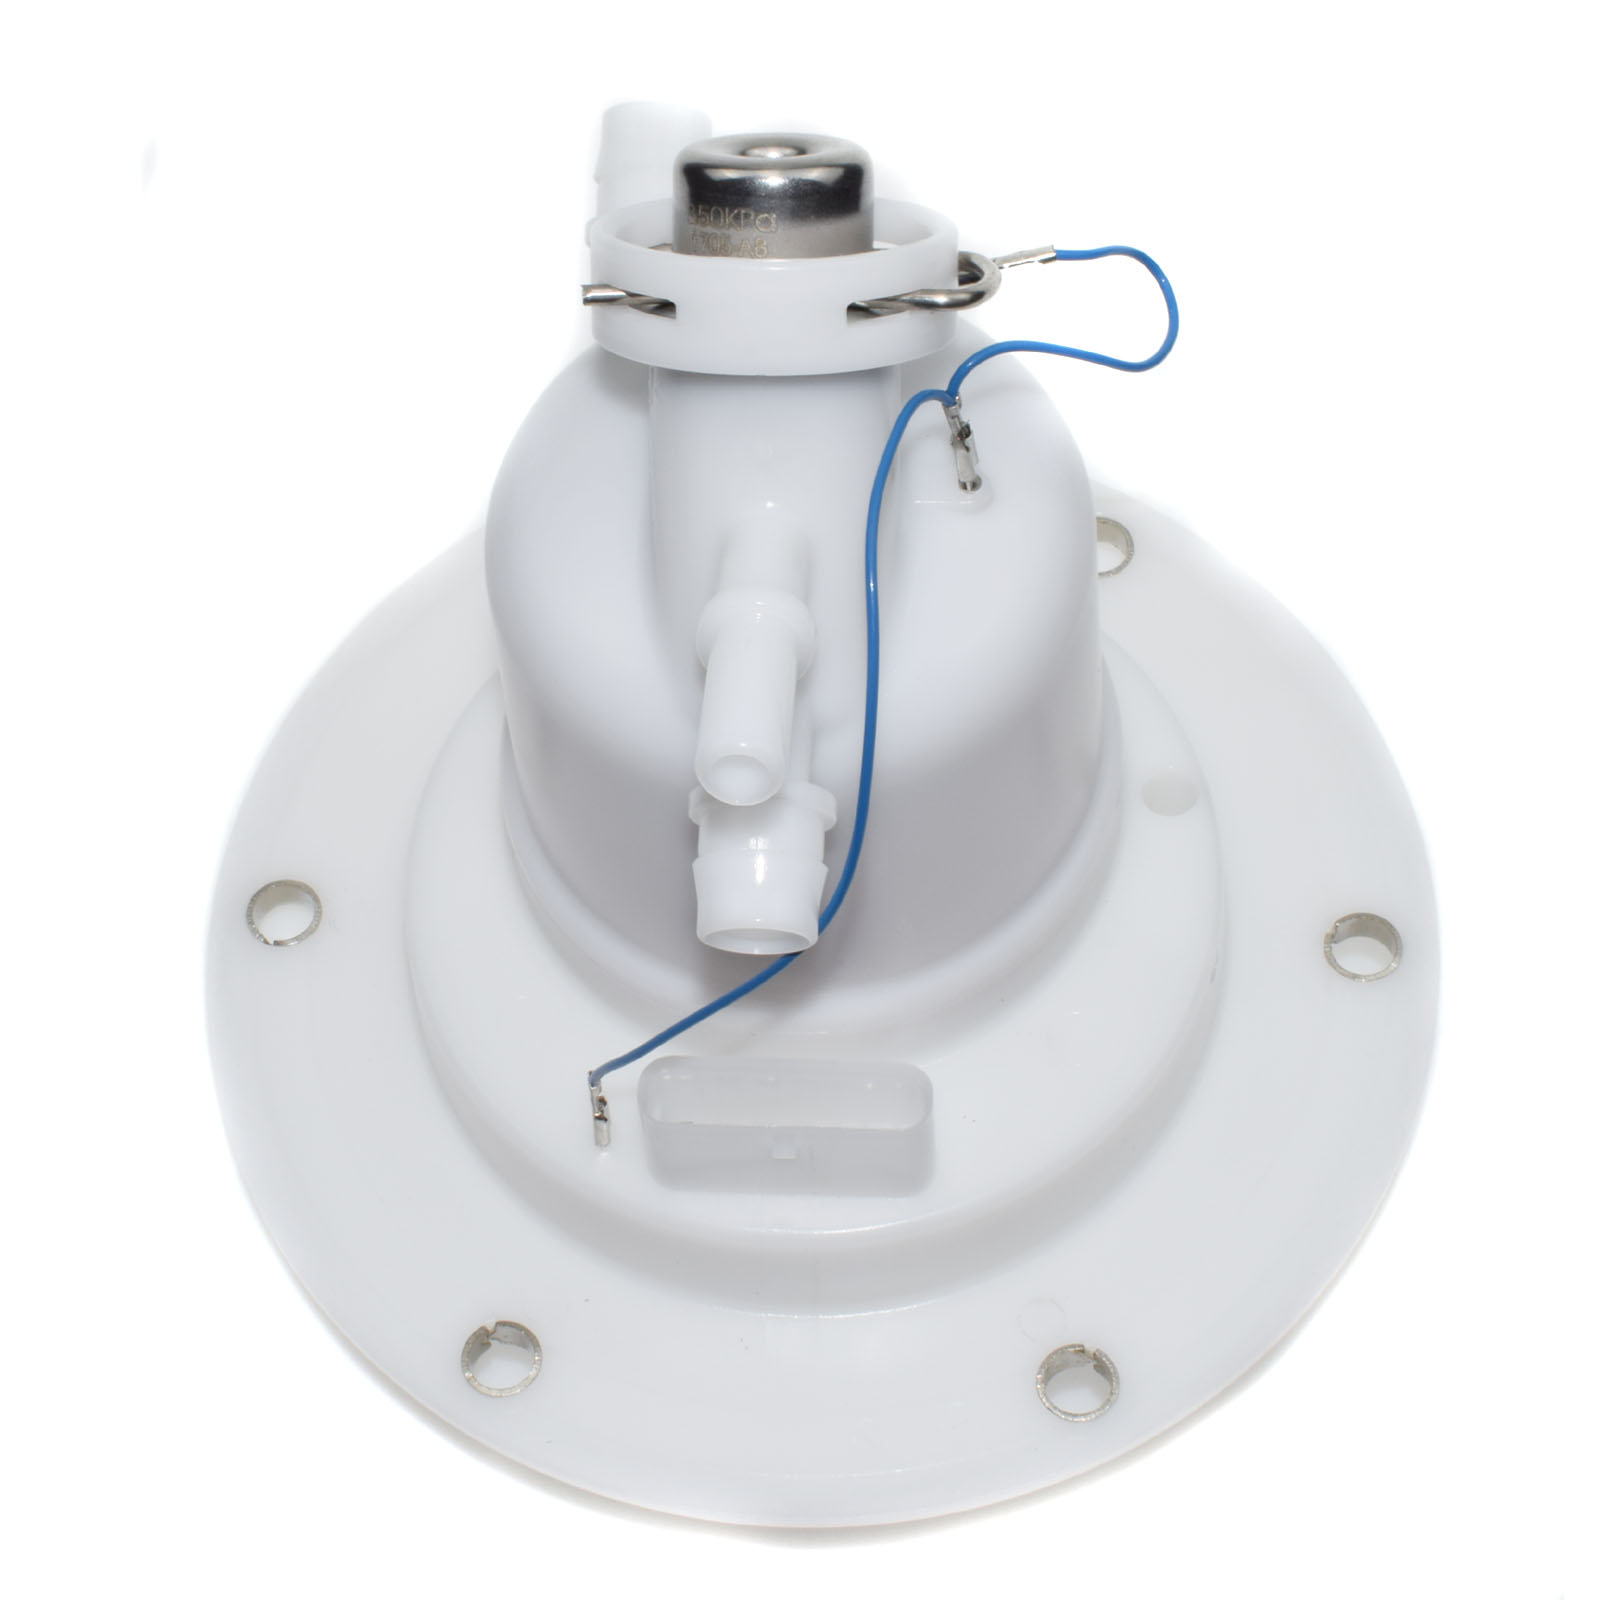 Wolfigo Fuel Pump Filter Strainer 2214701790 For Car Mercedes Benz C230 W221 C280 C300 Cl600 E350 E500 S450 Glk350 2008 2012 In Pumps From Automobiles